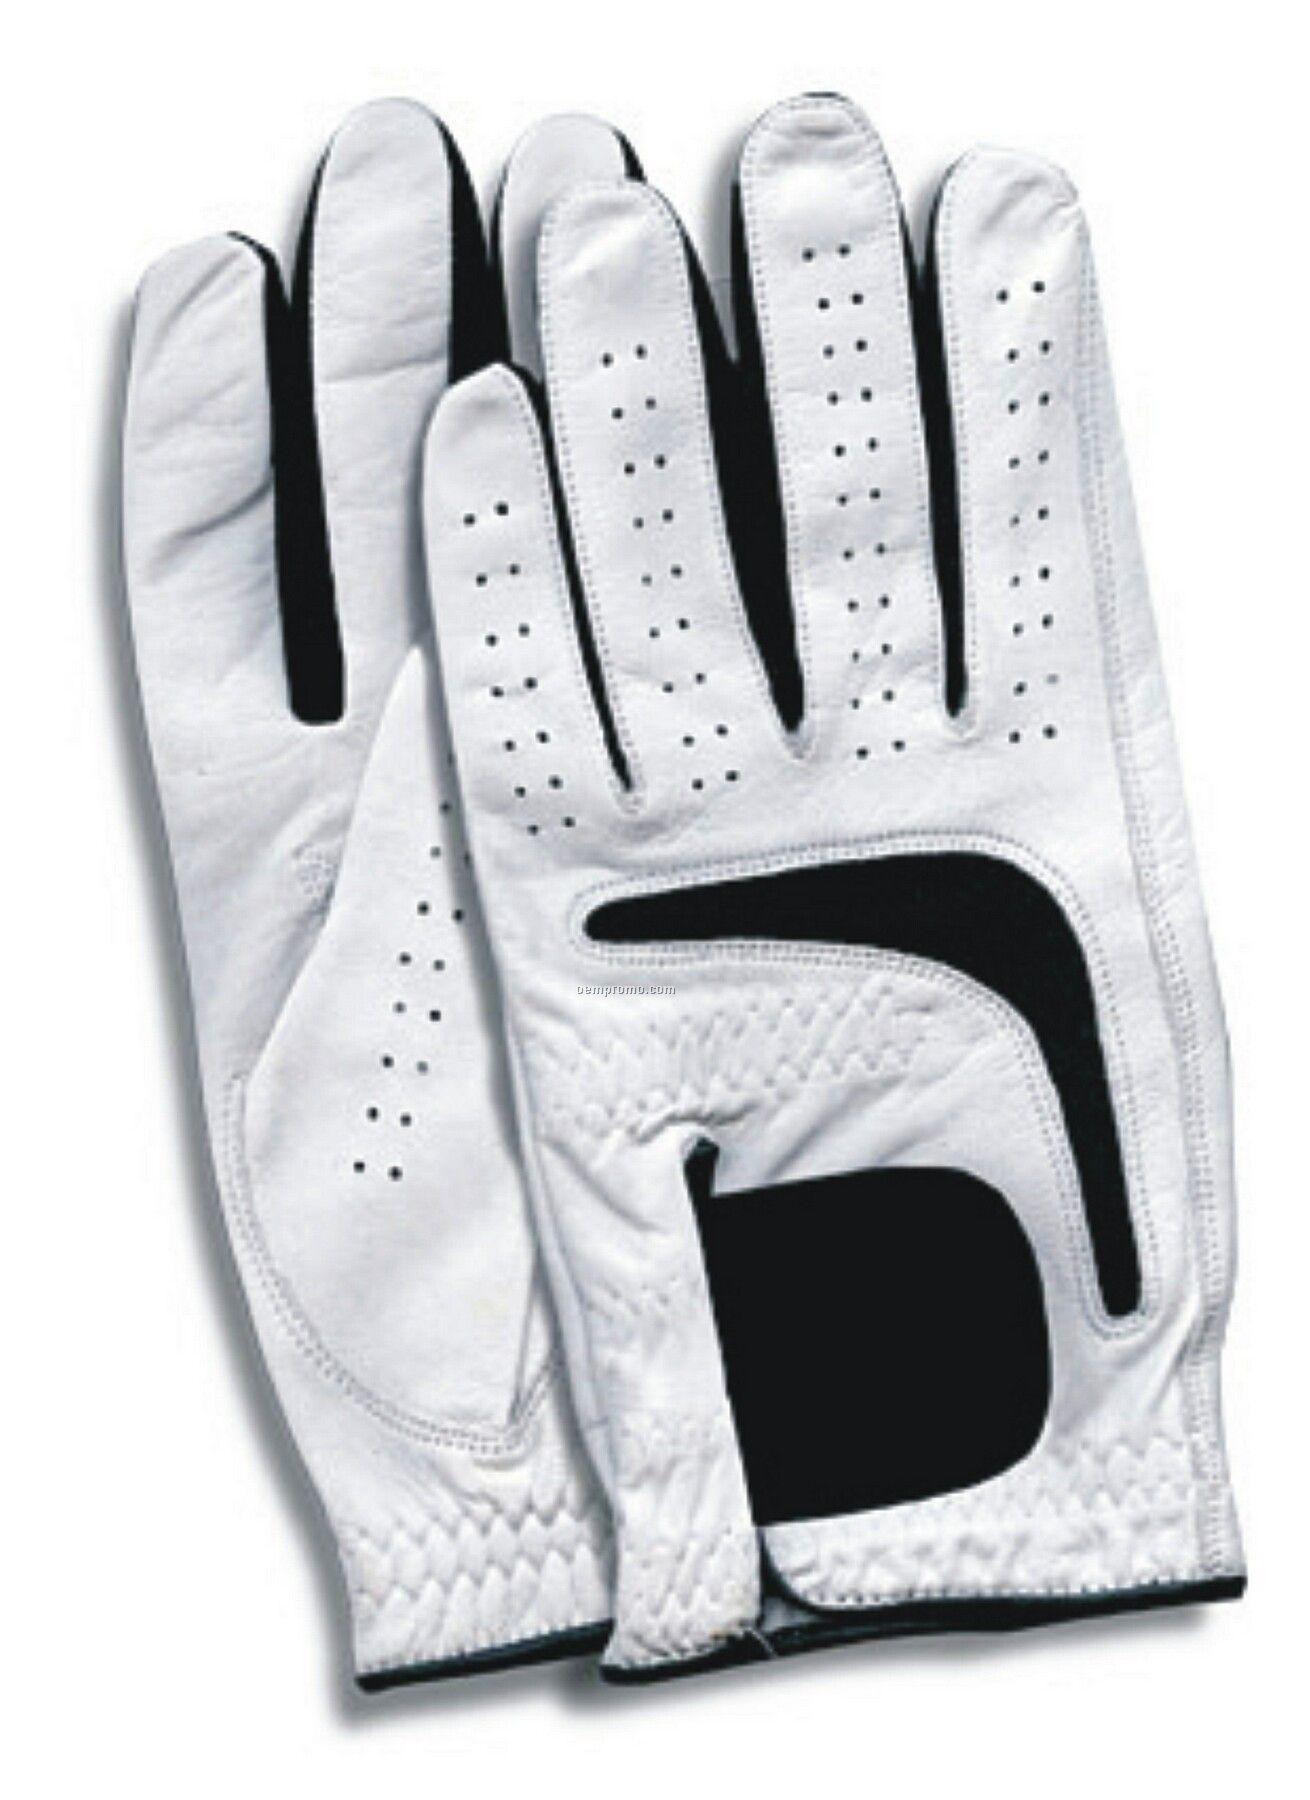 Black leather golf gloves -  Cabretta Leather Golf Gloves Reviews Gloves